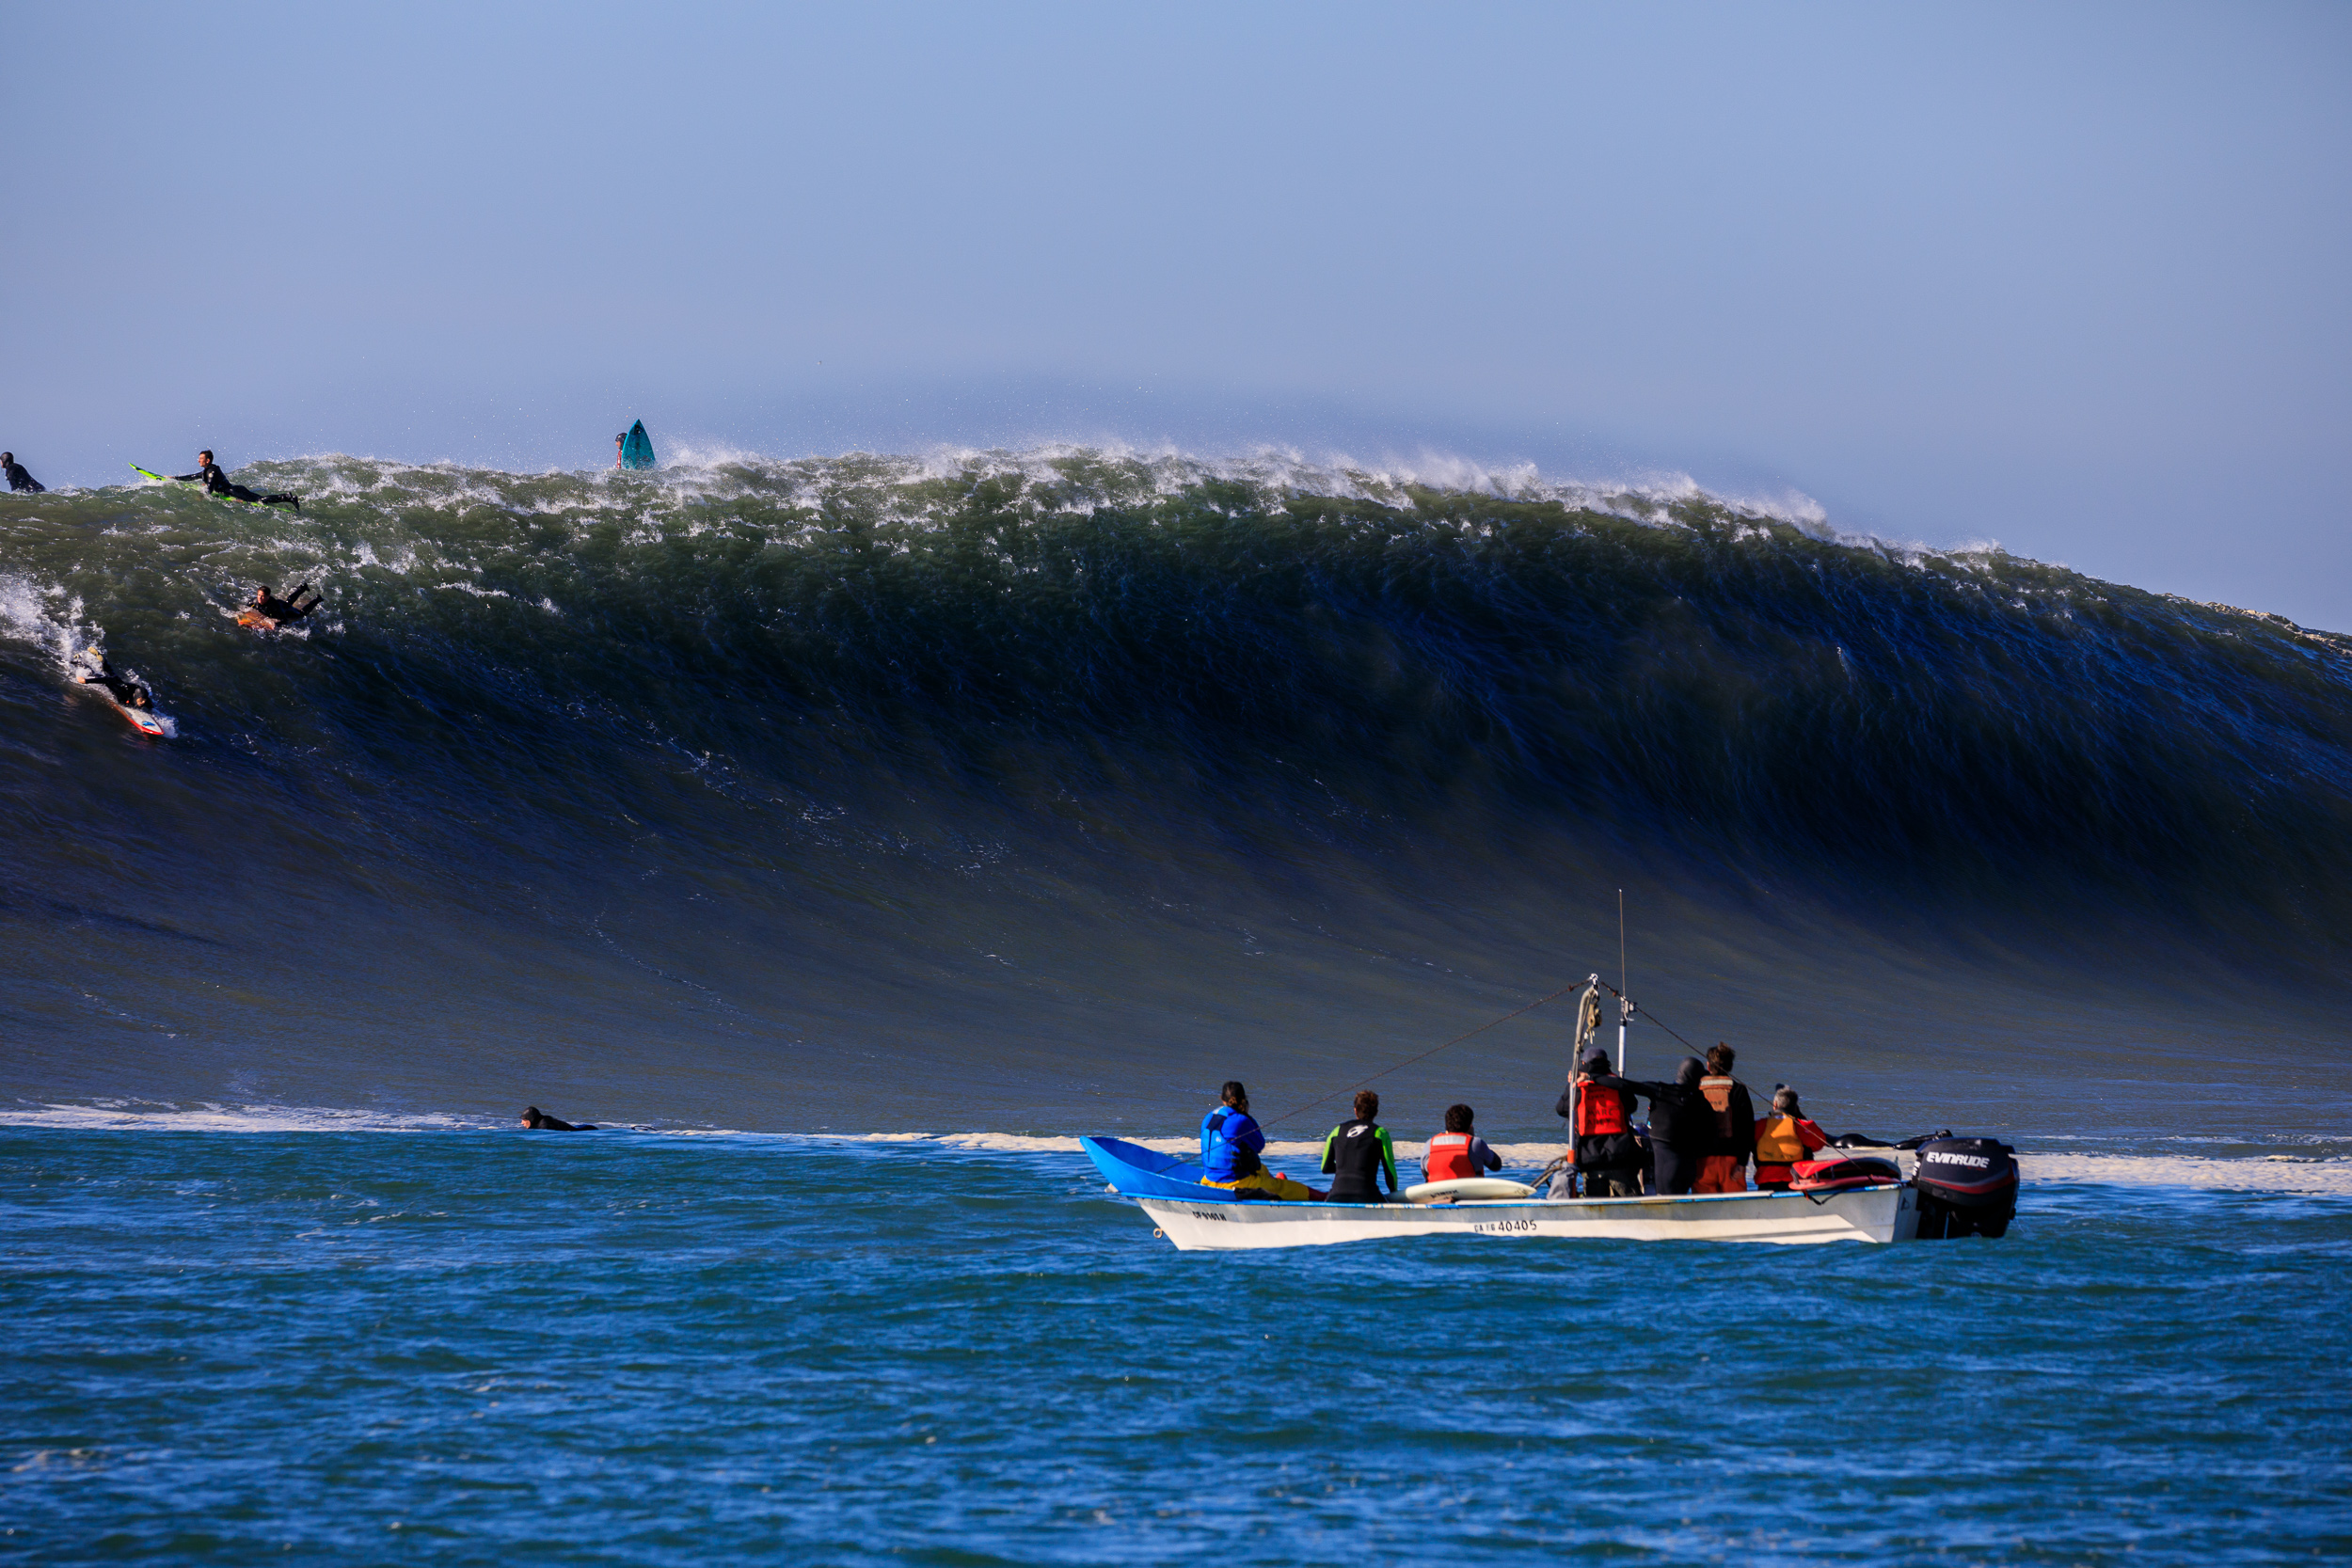 Mechanics of Maverick's: Breaking Down California's Iconic XL Wave